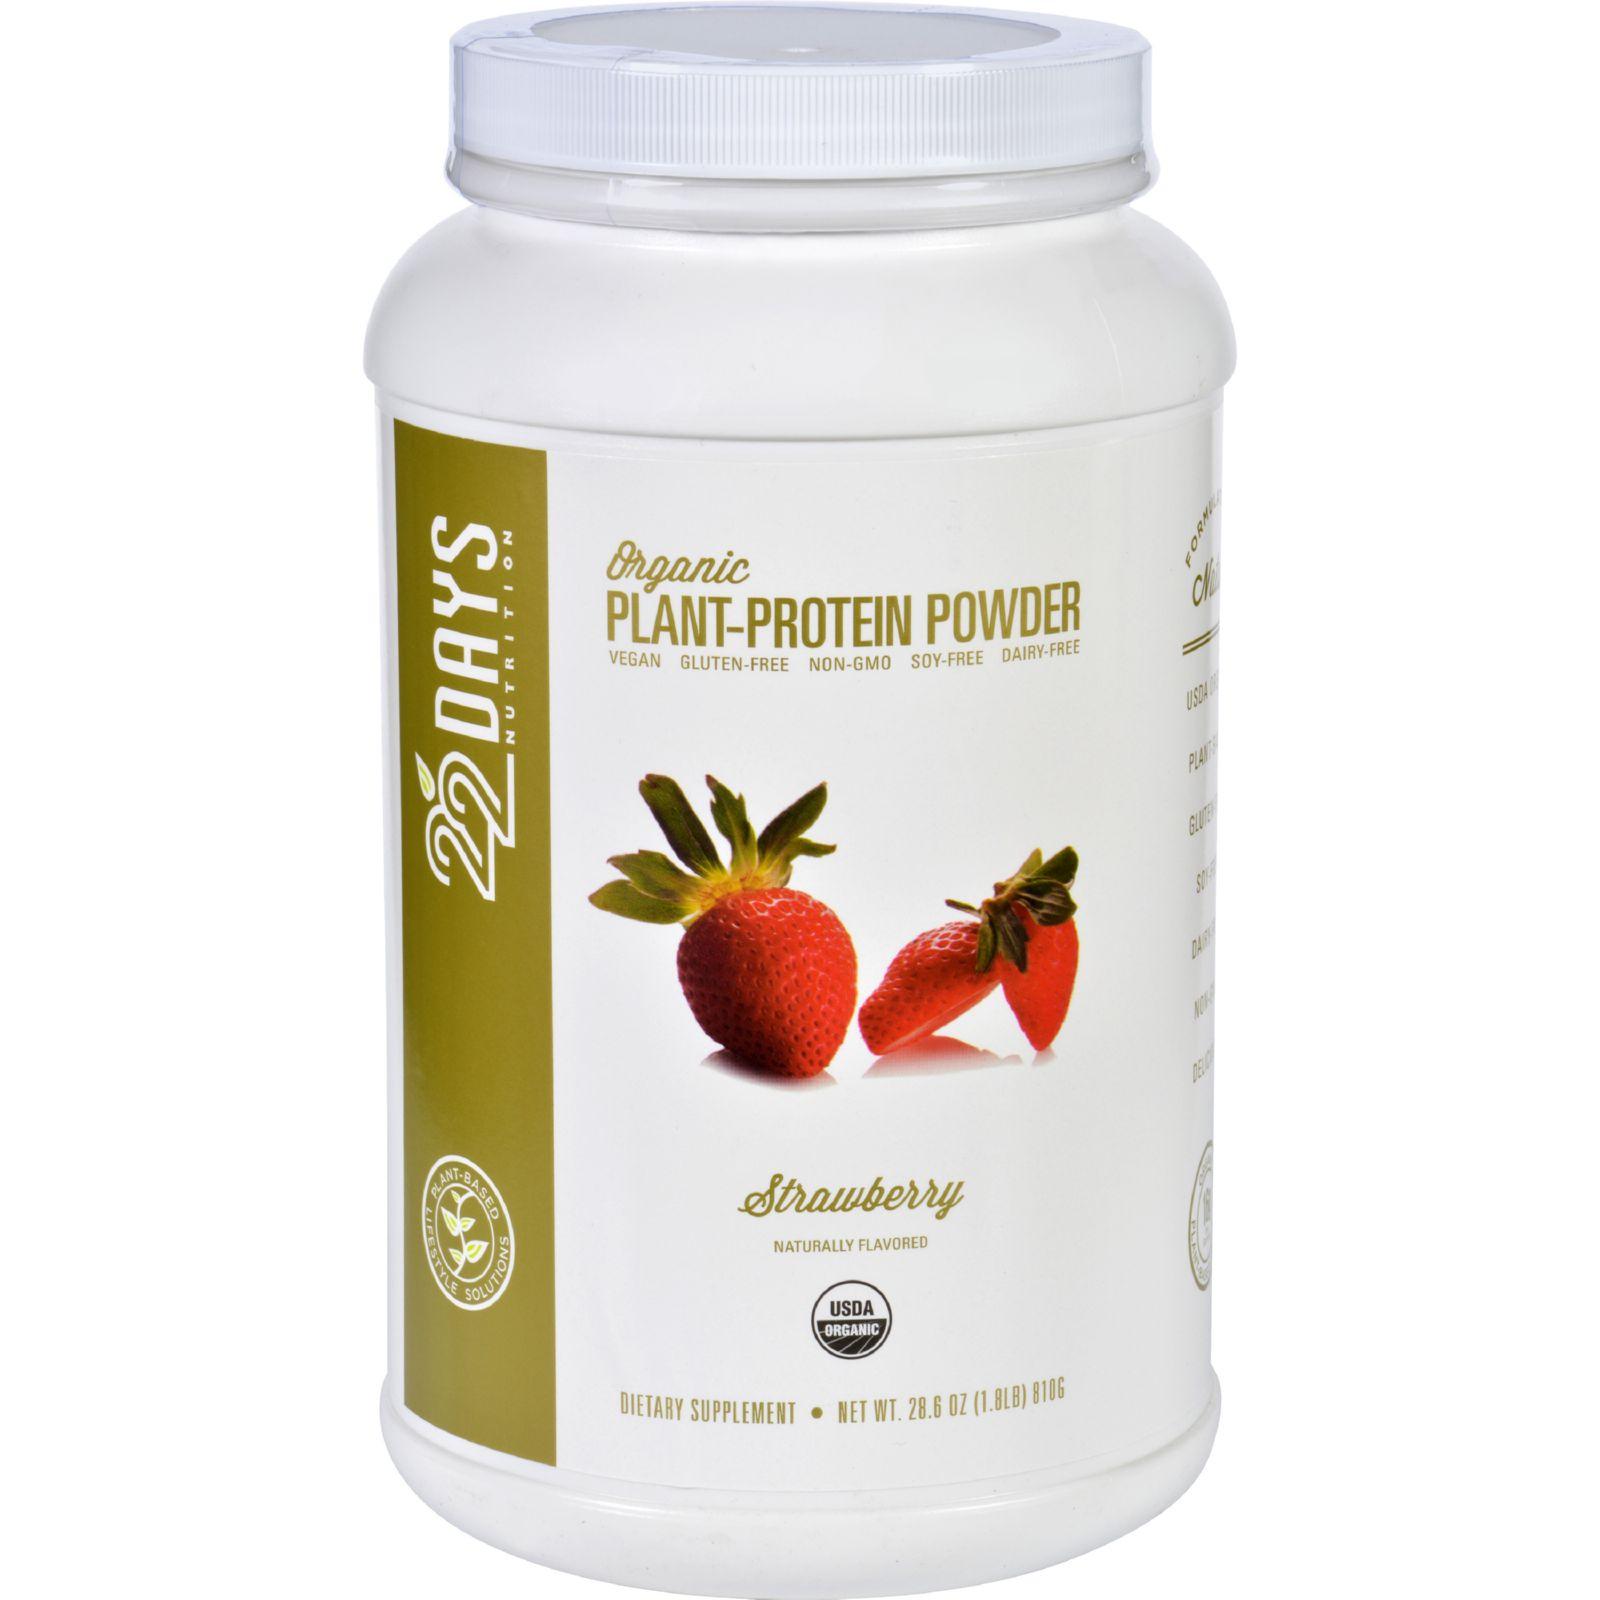 Organic Plant Protein Powder  28.6 Oz  (1.8 lb)  810 G Po...